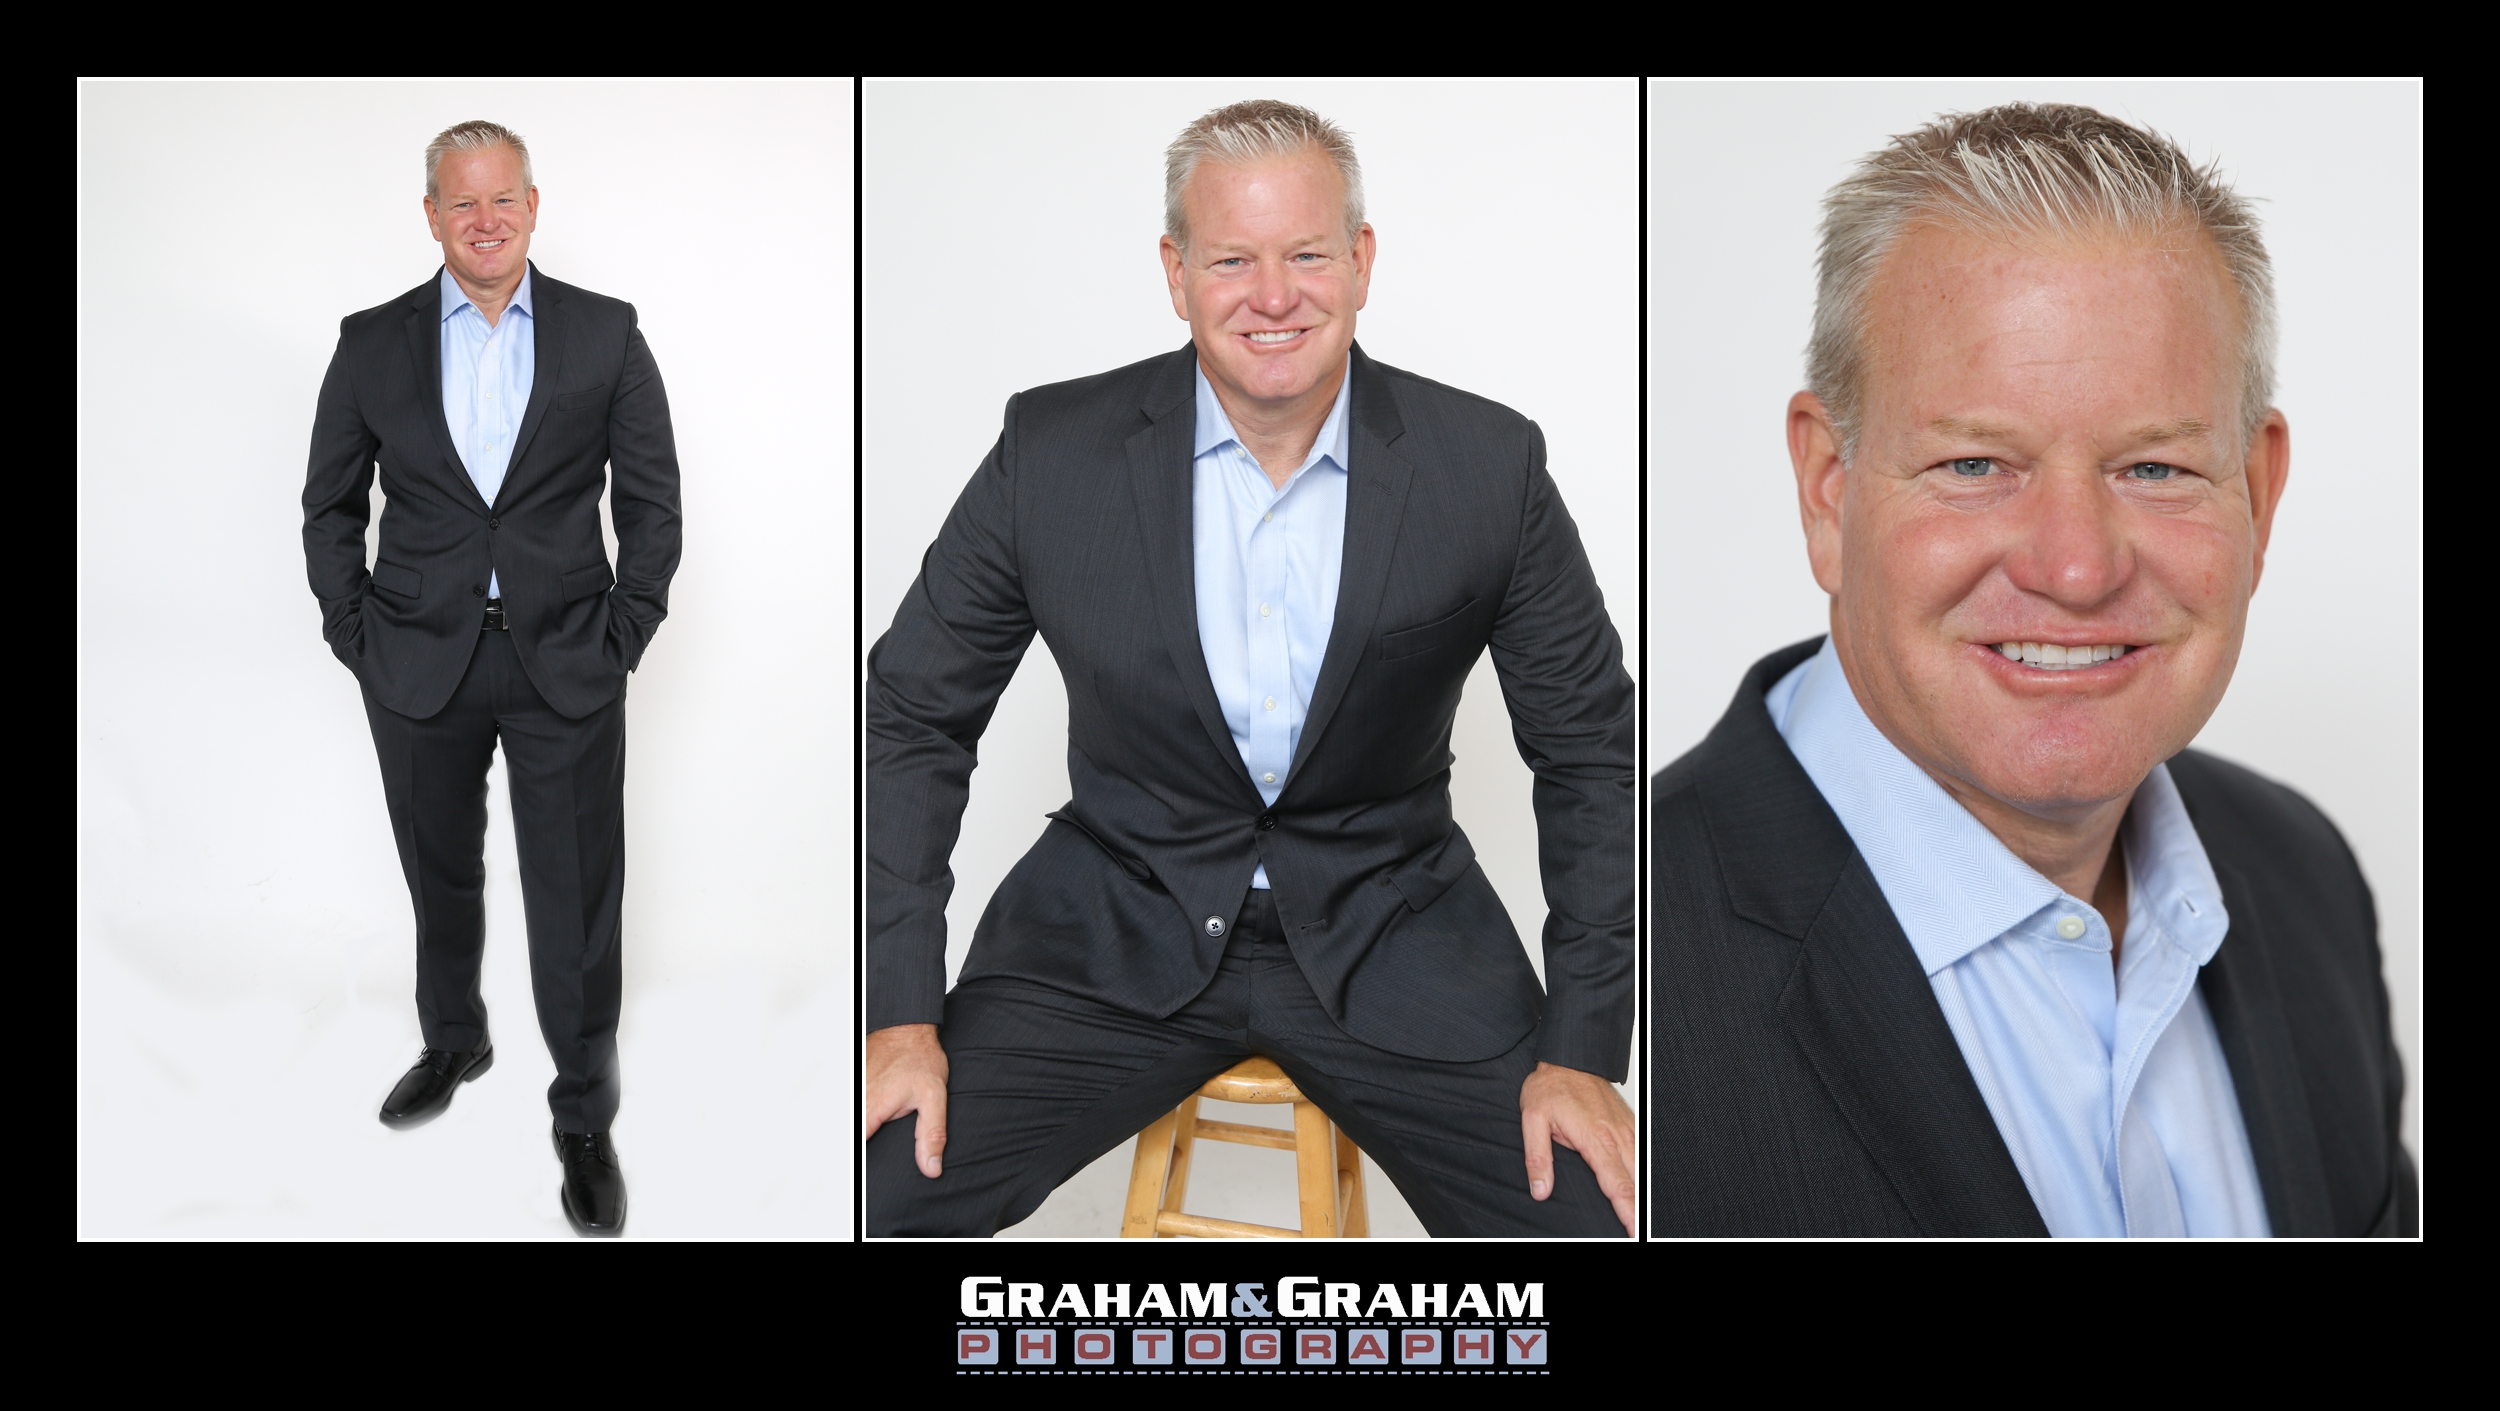 Graham and Graham Photography